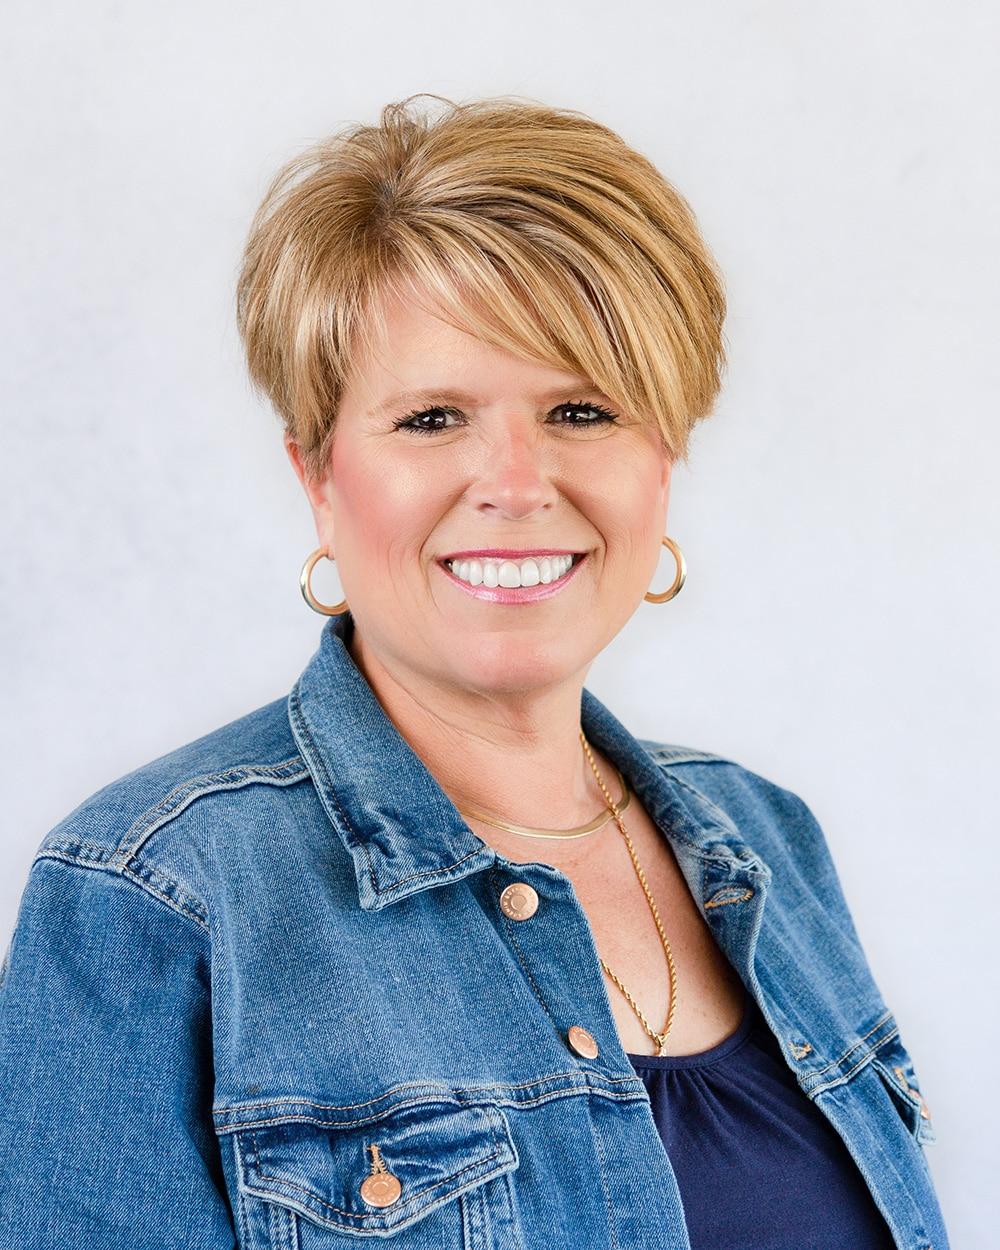 jane gifford - Fort Worth EM Residency Program